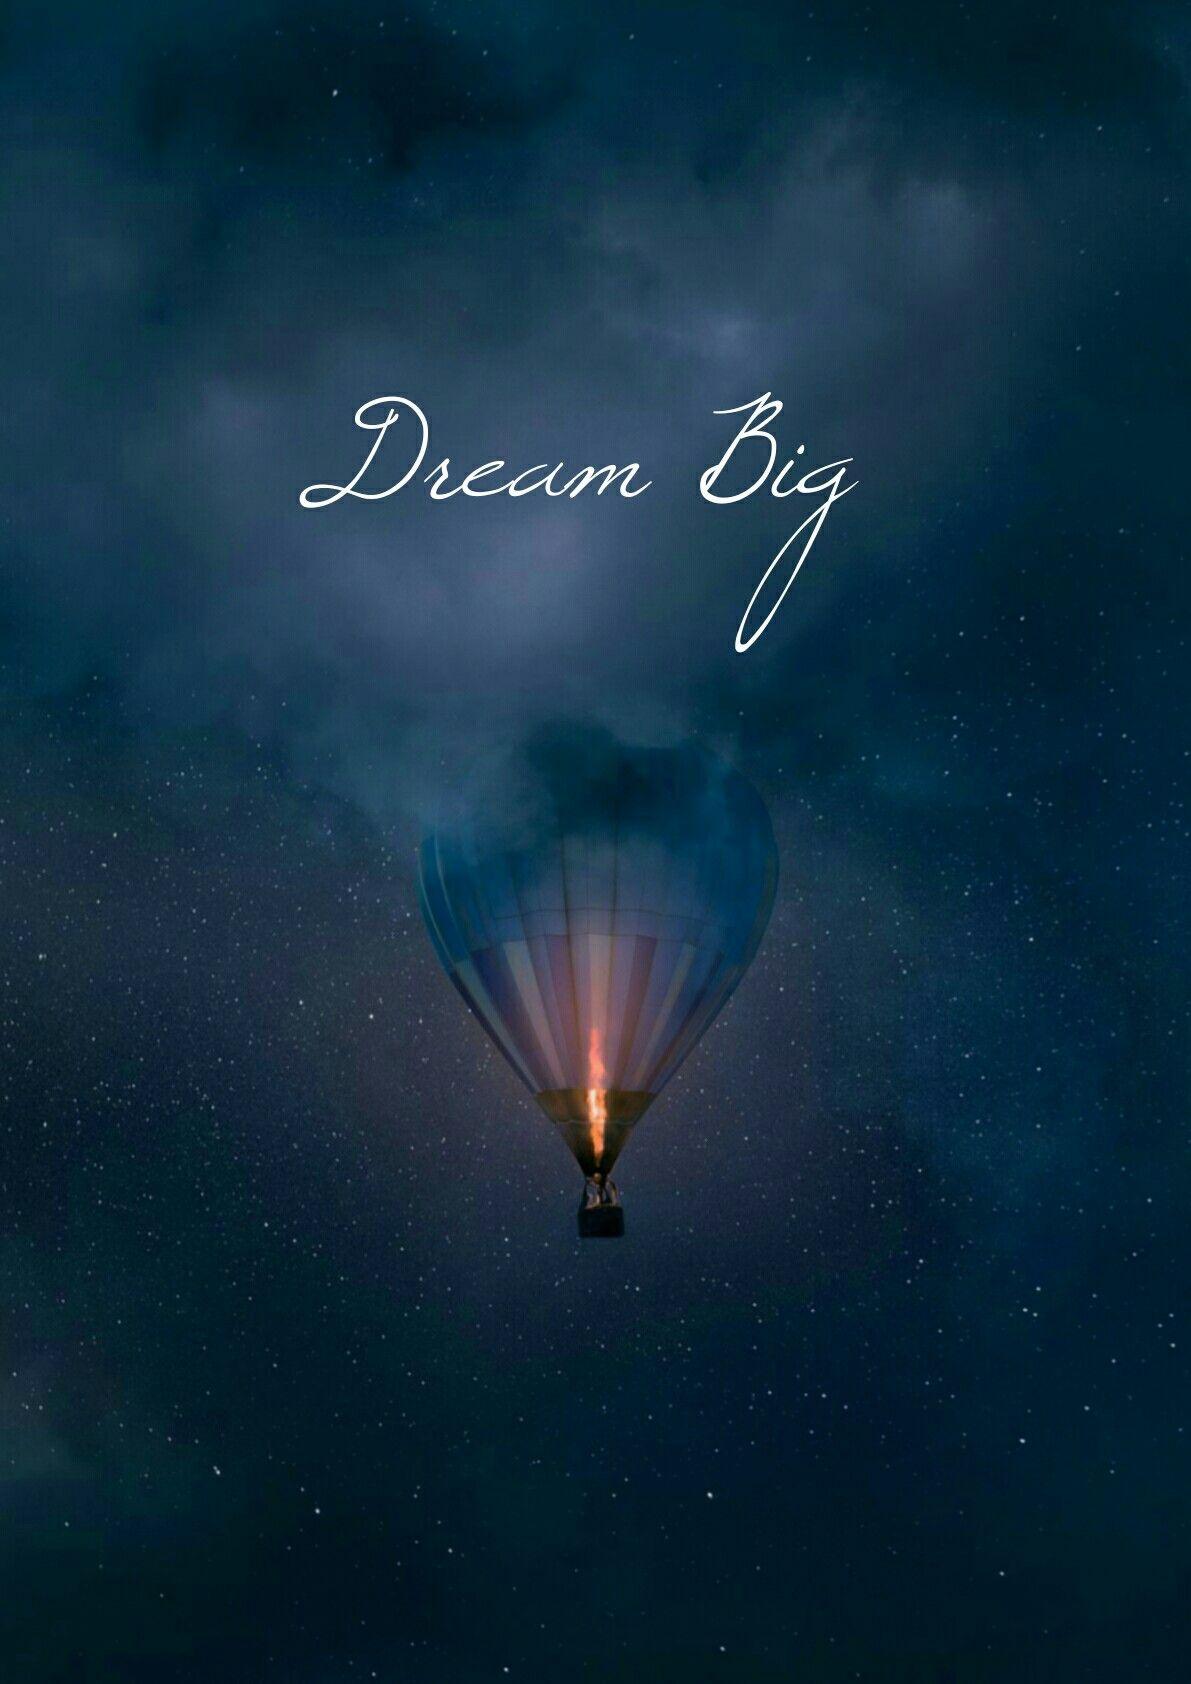 Dream big Quotes englishquotes   Dream big quotes, Galaxy ...